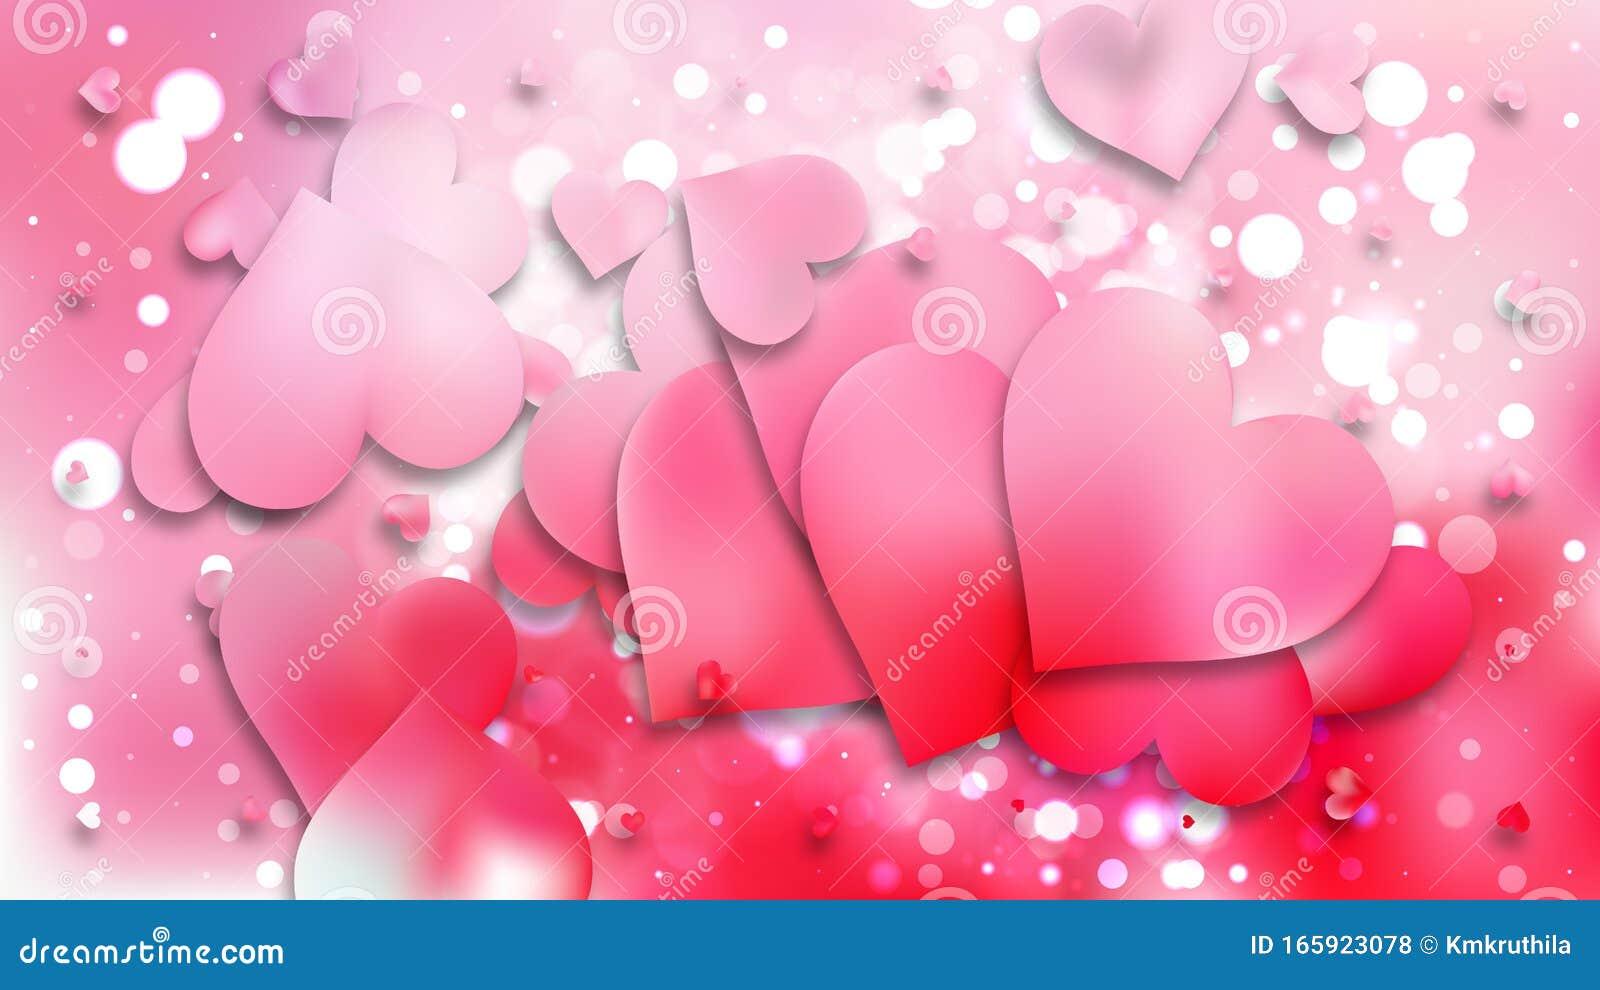 Light Pink Heart Wallpaper Background Stock Vector Illustration Of Background Romance 165923078